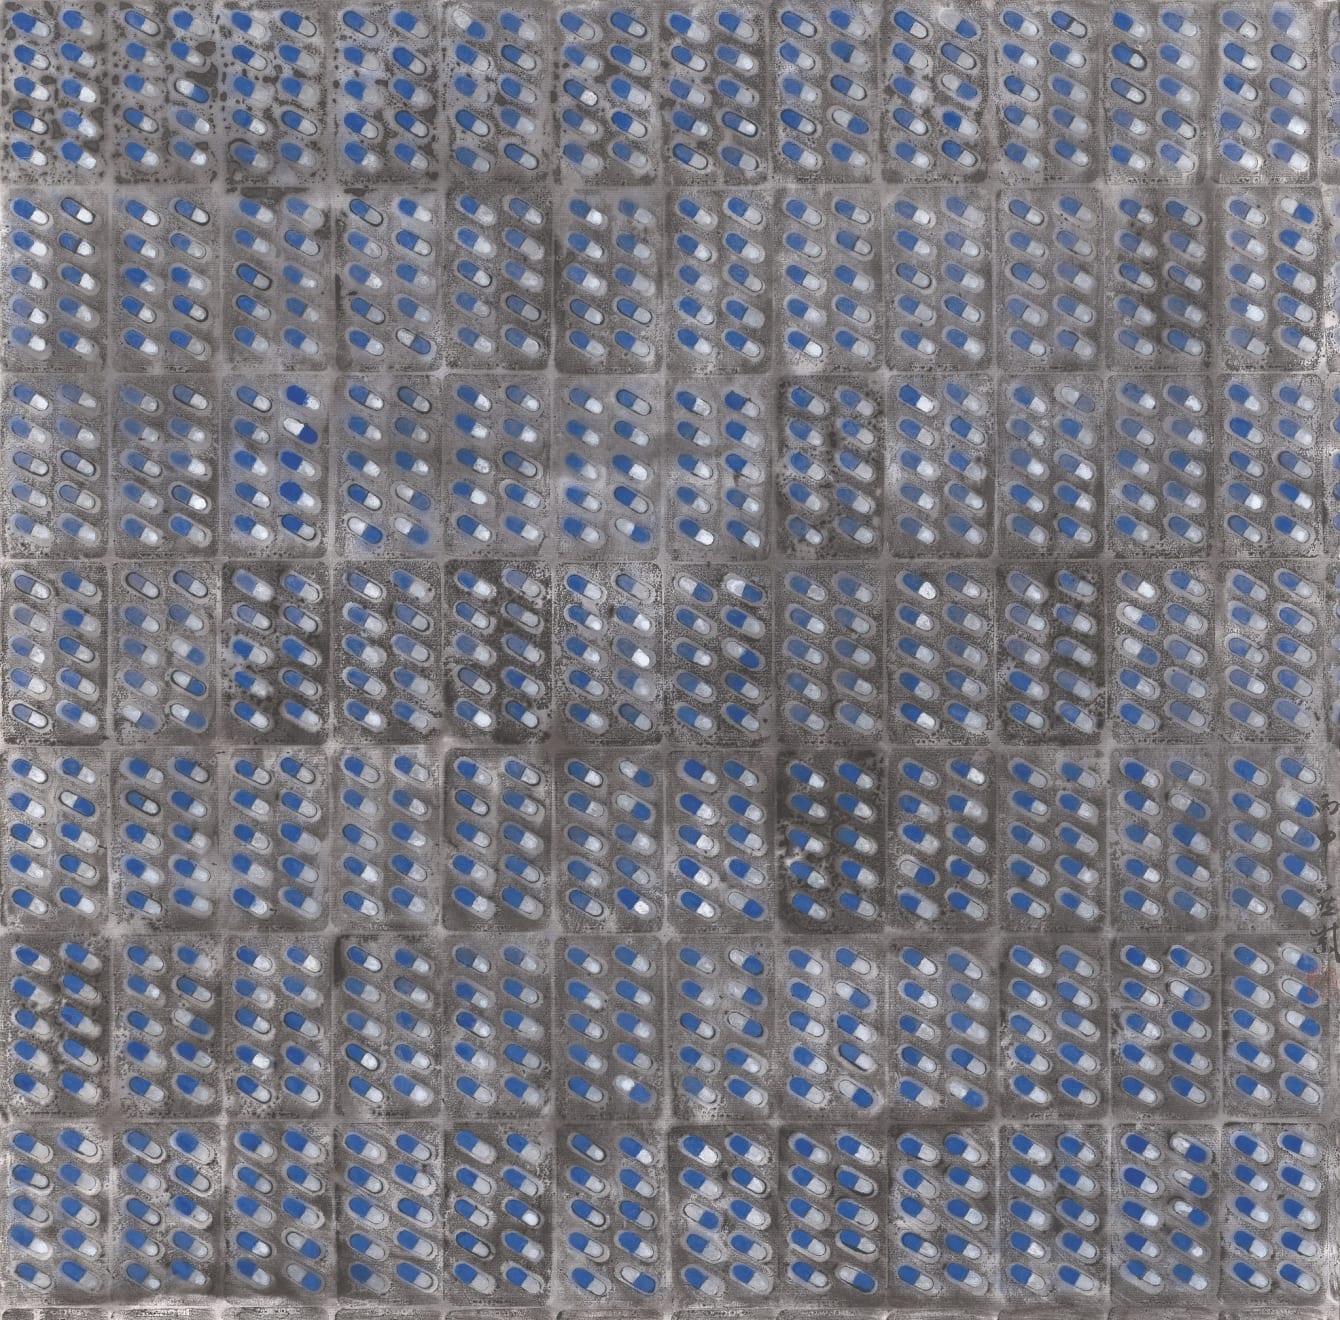 Zhang Yanzi 章燕紫, Medi-Chip 4 空芯片 4, 2016